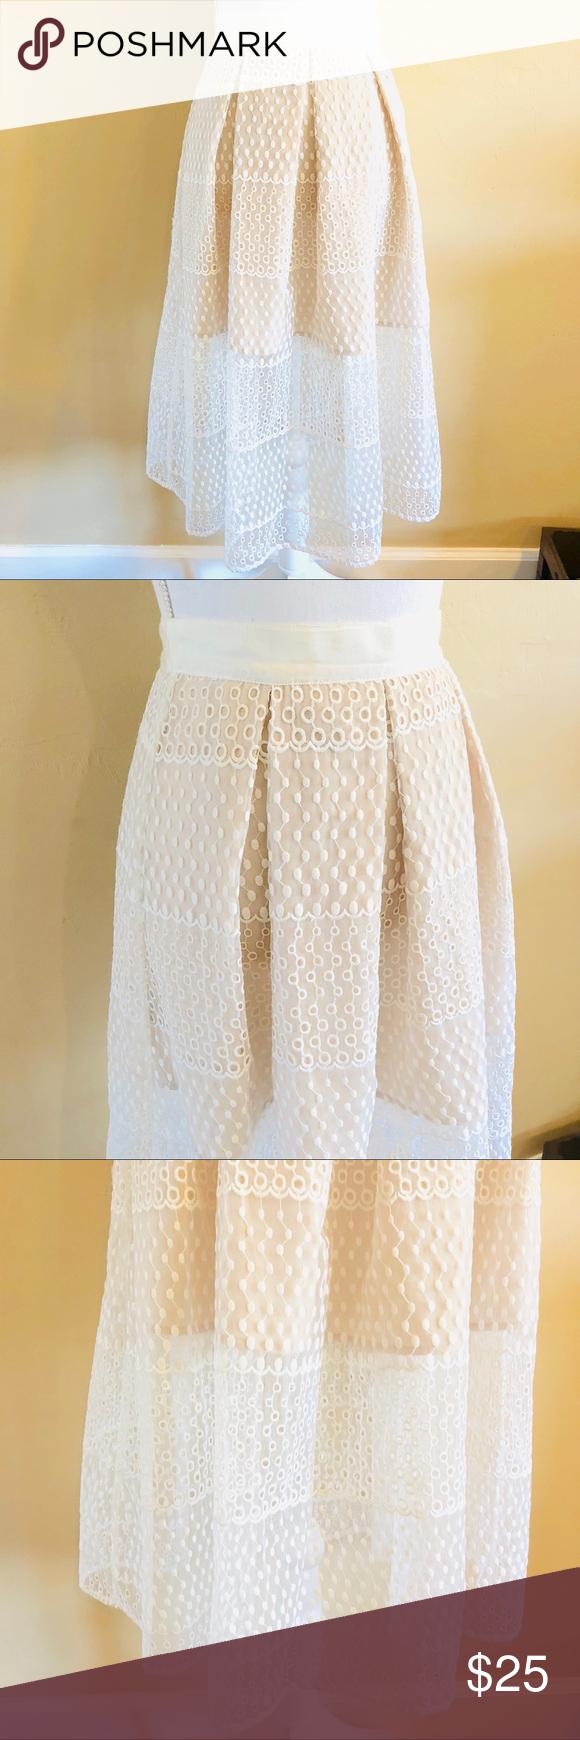 ead465b261 { GIANNI BINI } Midi Eyelet Sheer Blogger Skirt Gianni Bini Size Small  White Eyelet Sheer